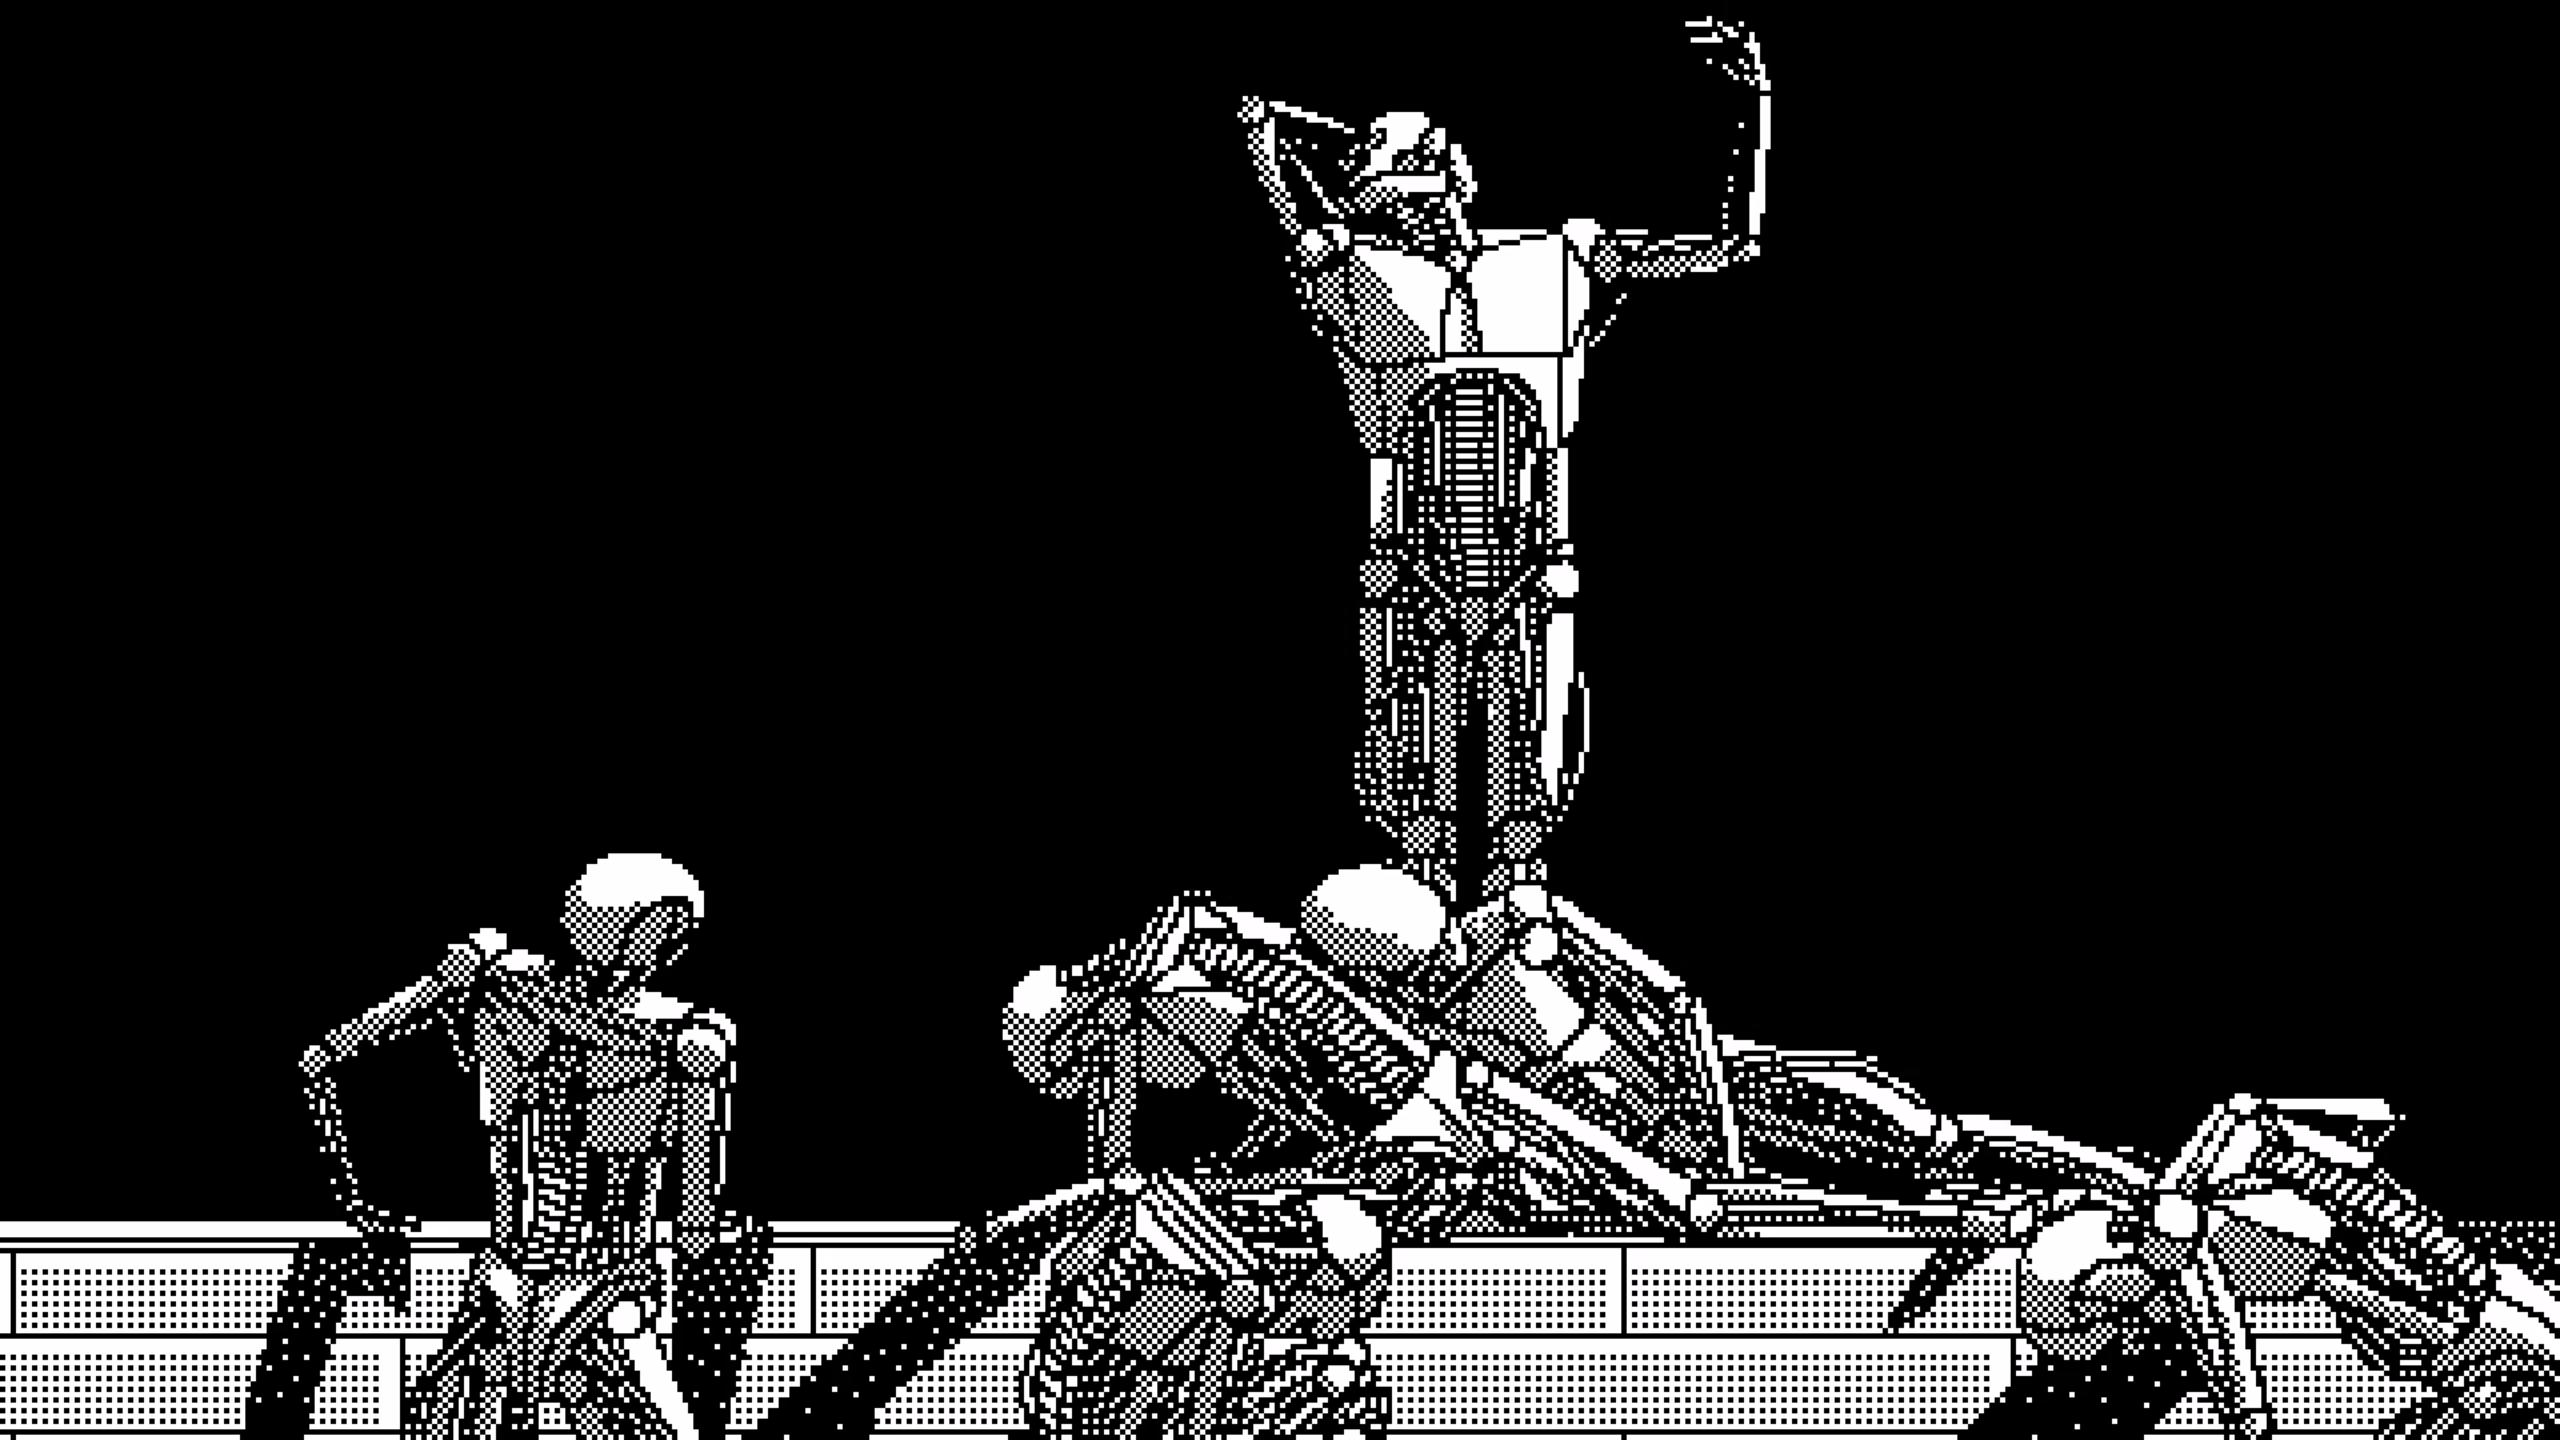 inside  surreal psychological cyberpunk nightmares as pixel art